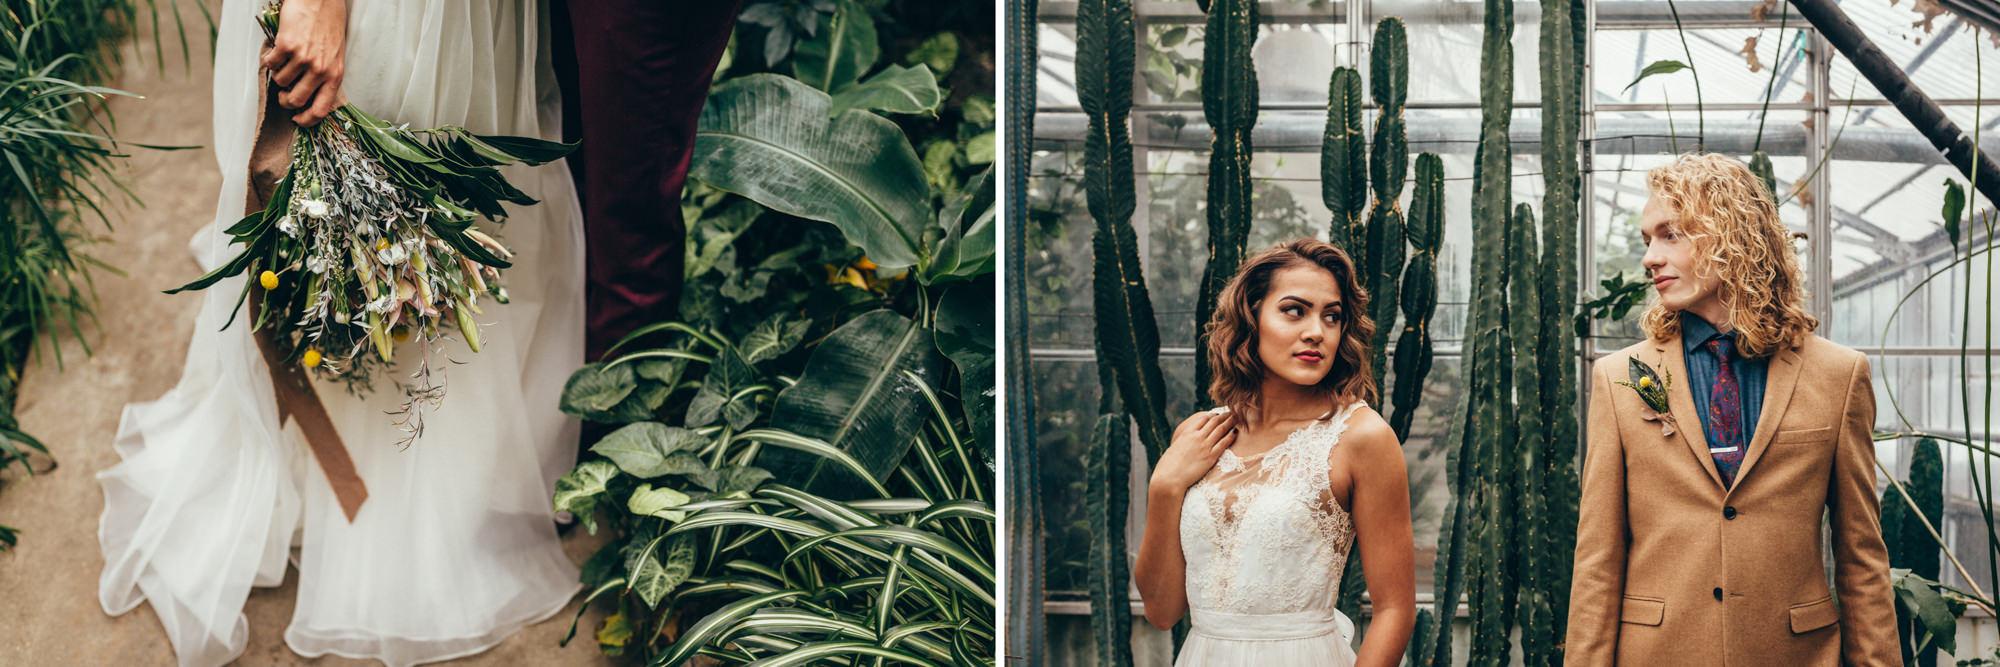 greenhouse-wedding-portrait.jpg